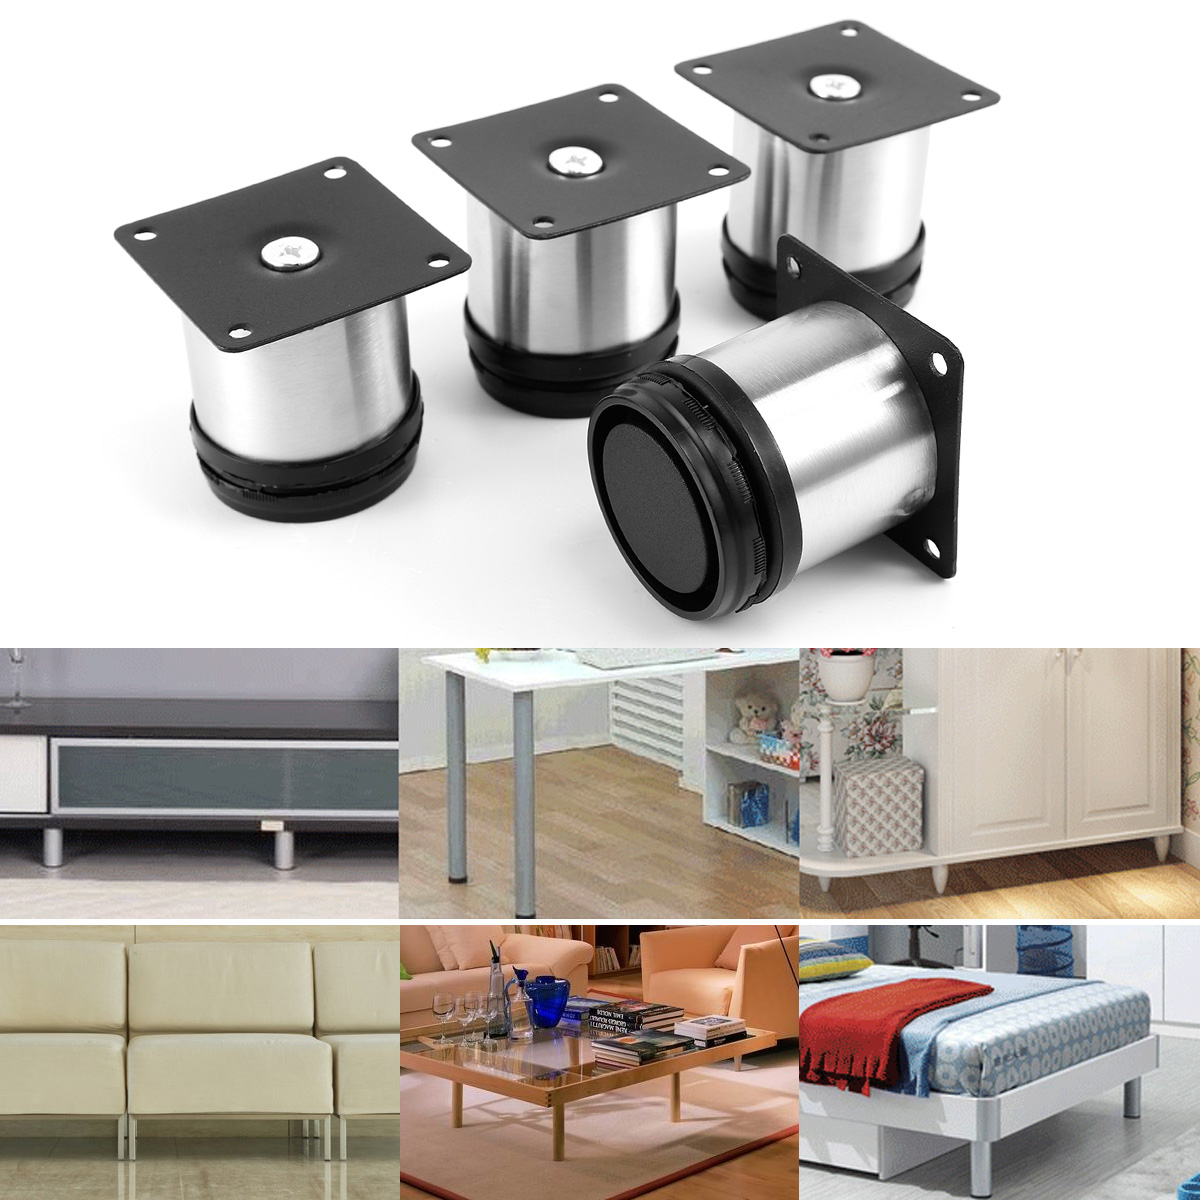 4 uds 6cm Patas de acero redonda regulables Ø50mm para muebles Pies ...